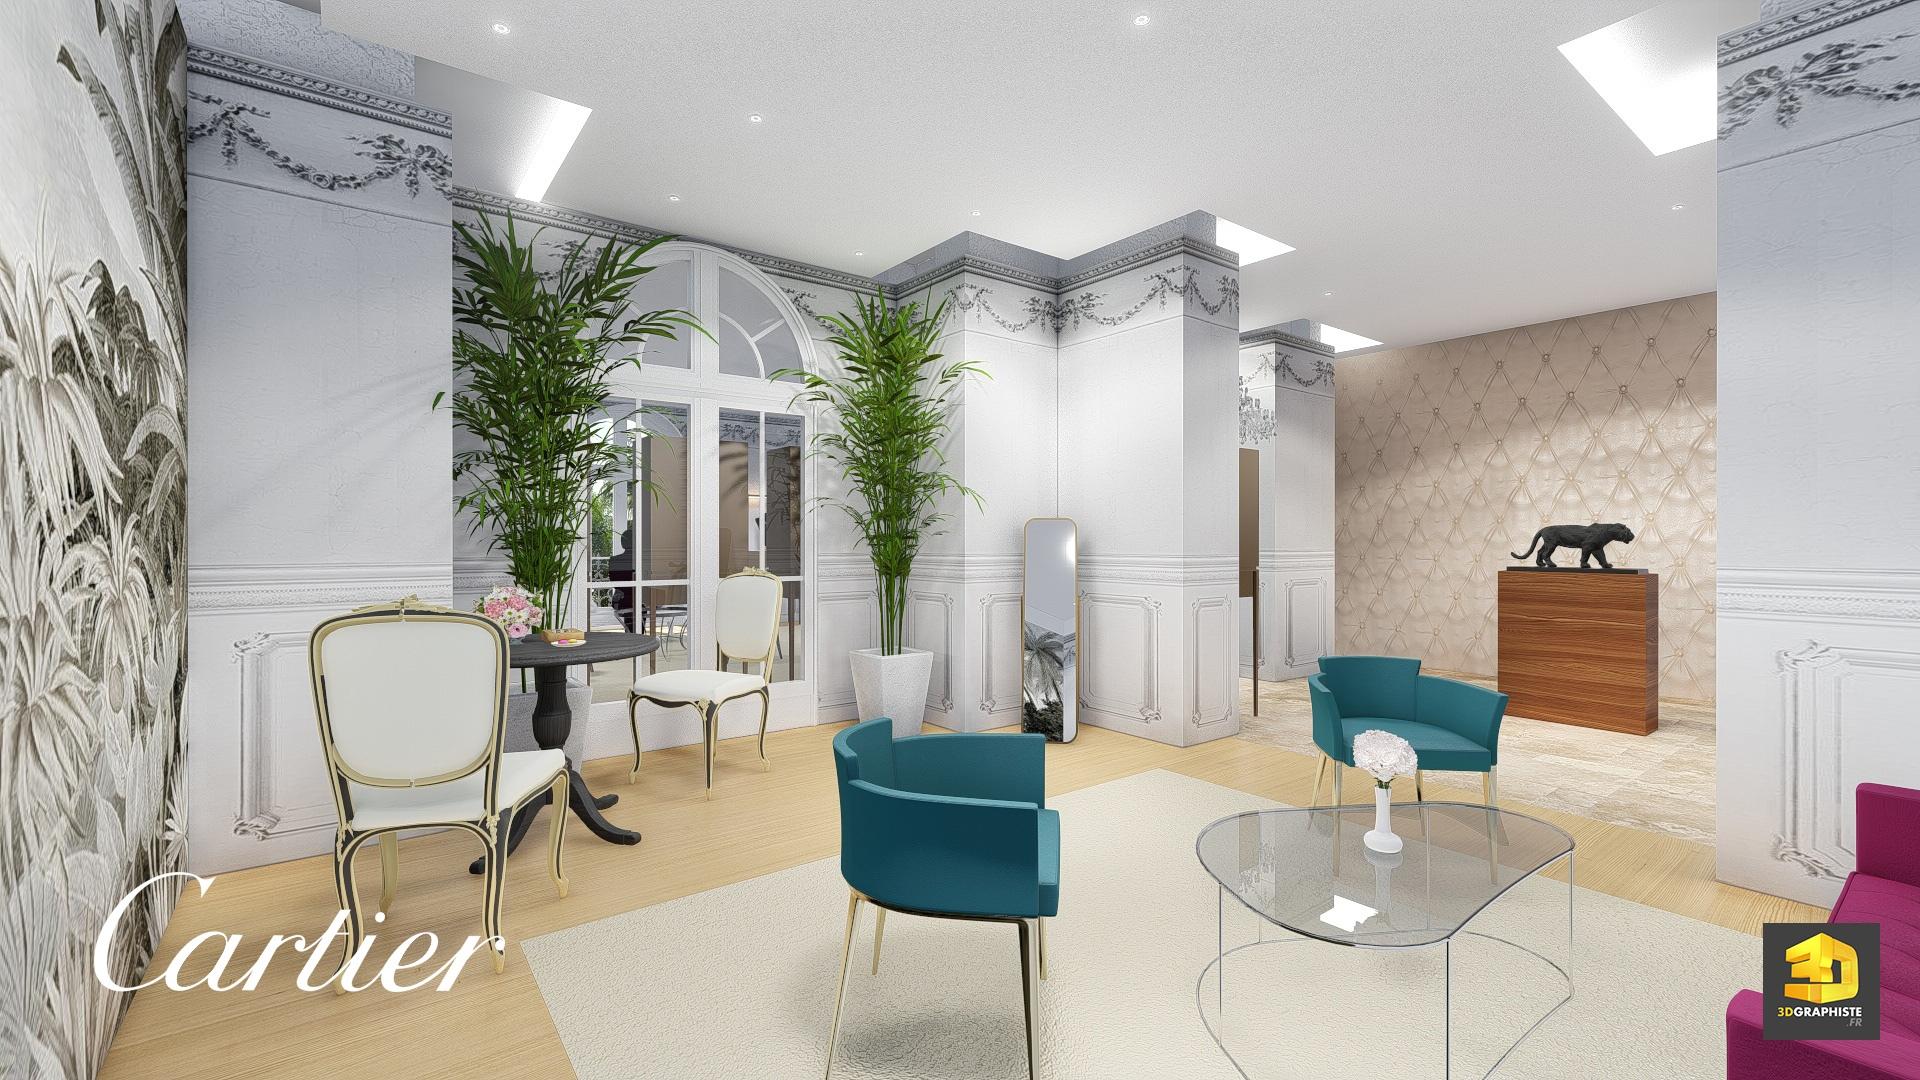 design d int rieur showroom cartier rough 3d 3dgraphiste fr. Black Bedroom Furniture Sets. Home Design Ideas